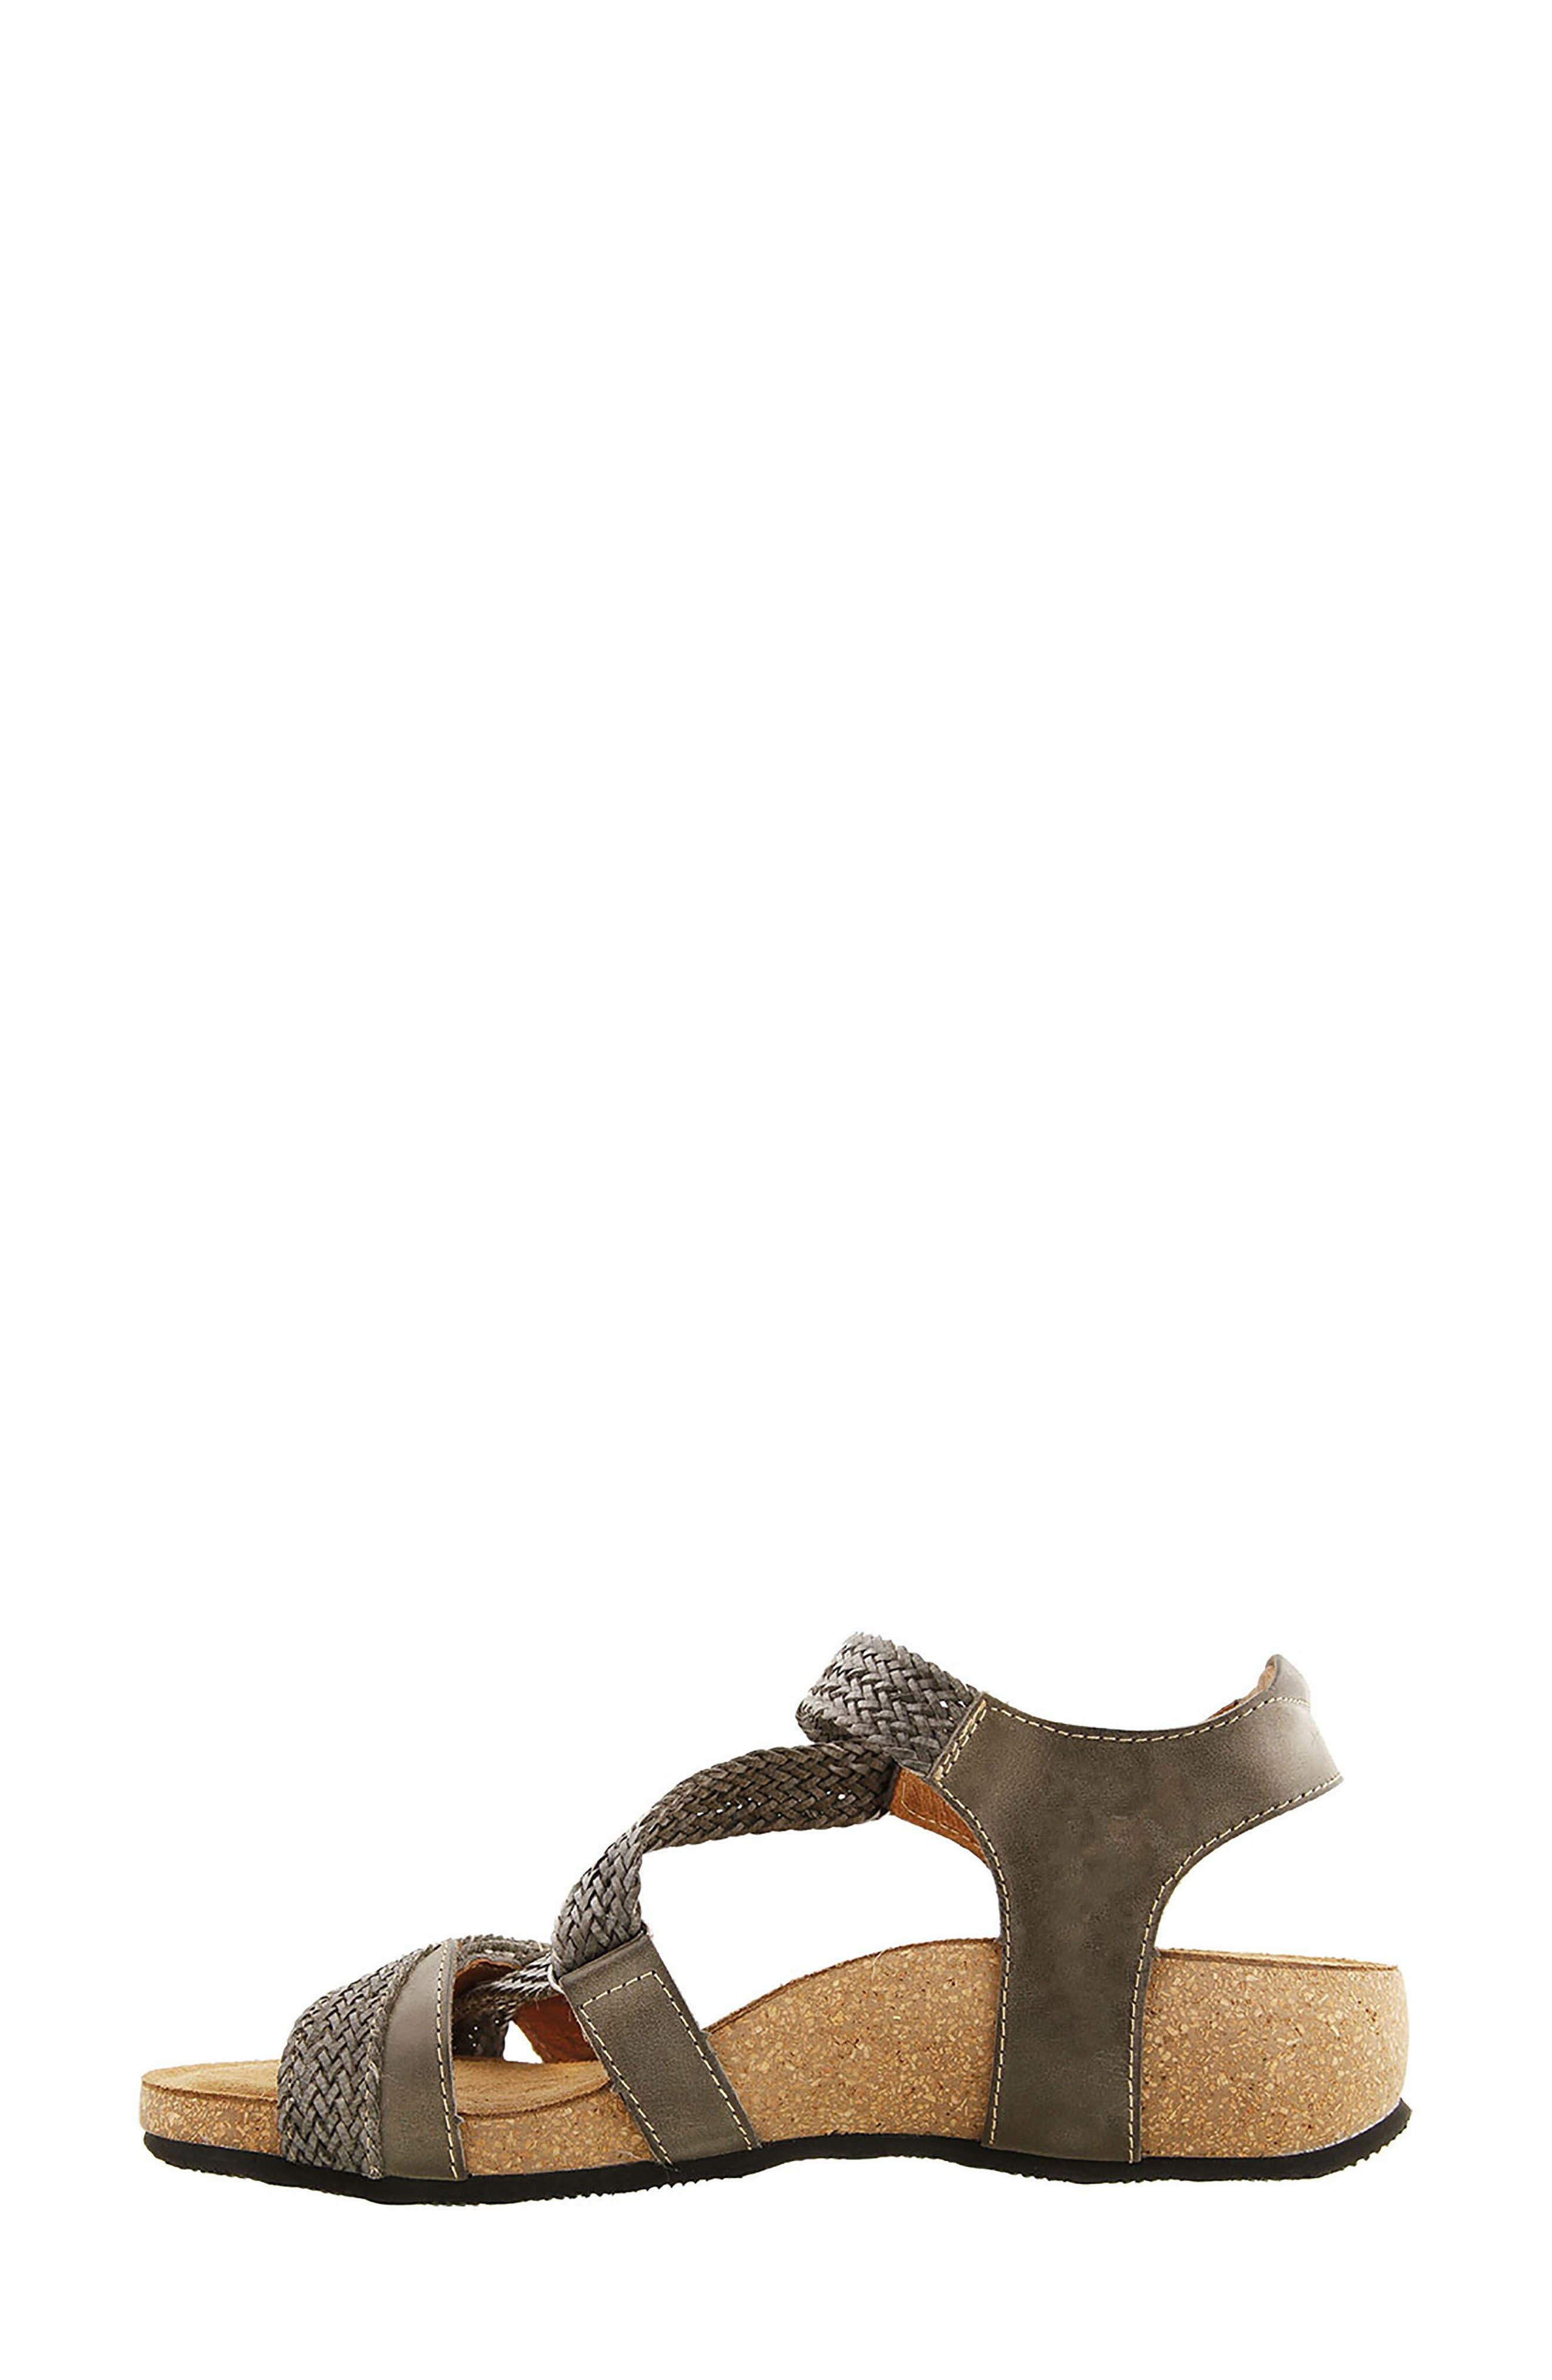 TAOS,                             'Trulie' Wedge Sandal,                             Alternate thumbnail 3, color,                             022